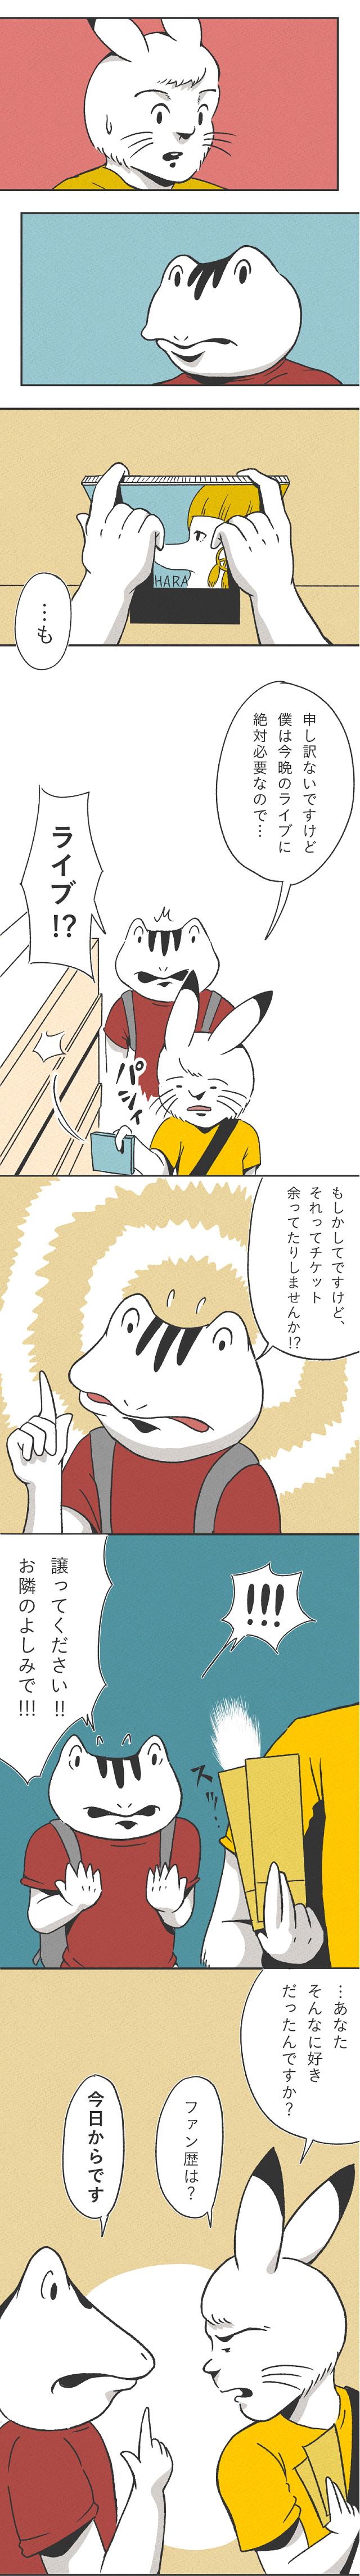 【漫画】鳥獣テラ 第二話「同行者」